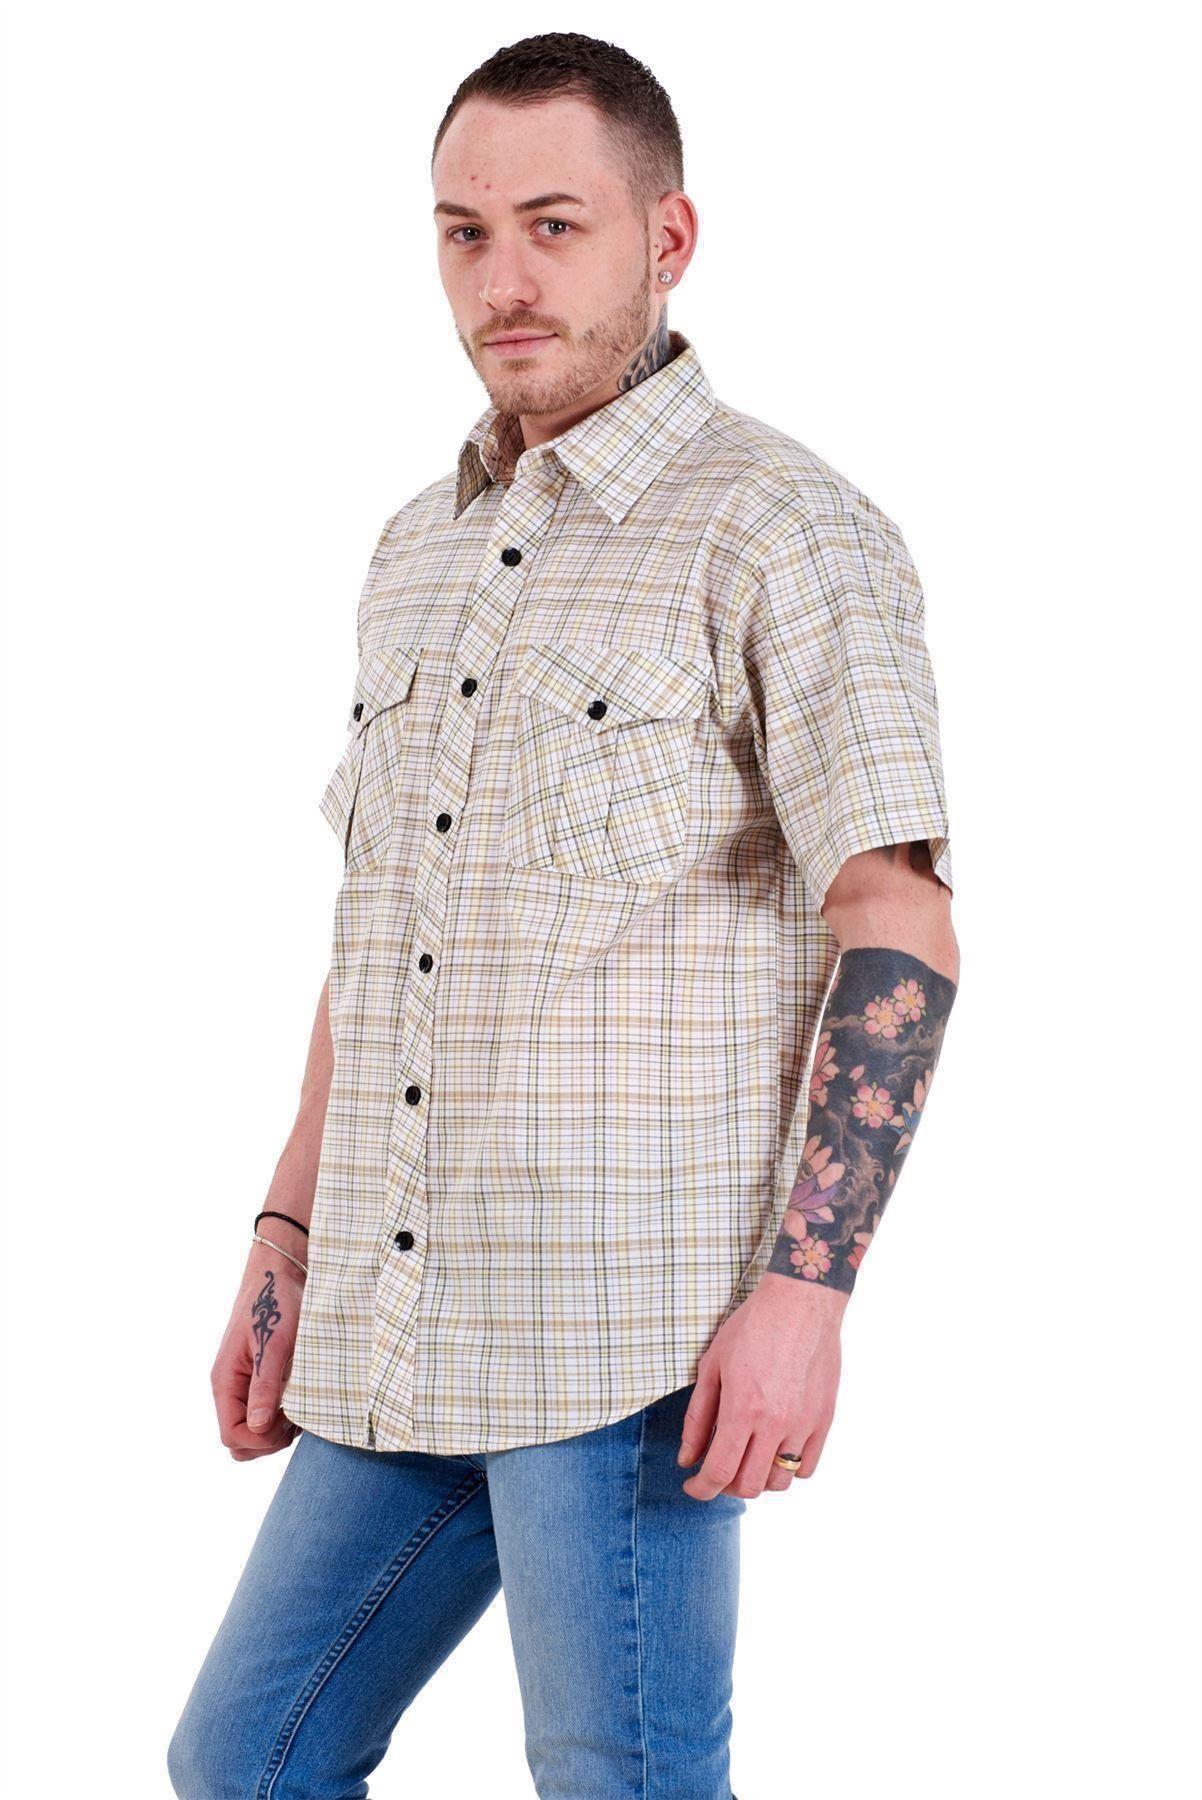 Mens-Regular-Big-Size-Shirts-Checked-Cotton-Blend-Casual-Short-Sleeve-M-to-5XL thumbnail 7